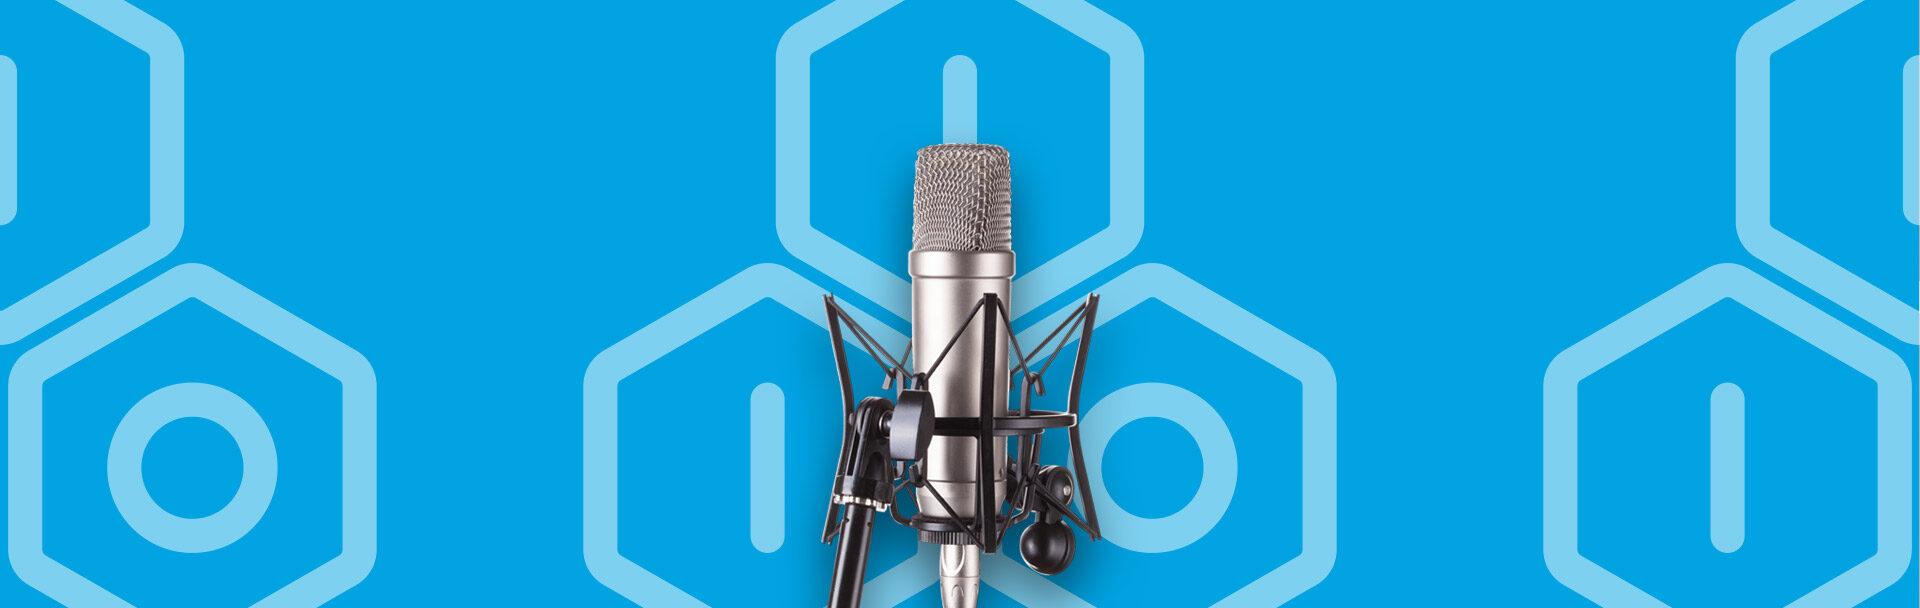 Podcast: Datakwaliteit en Datagovernance - Future Facts